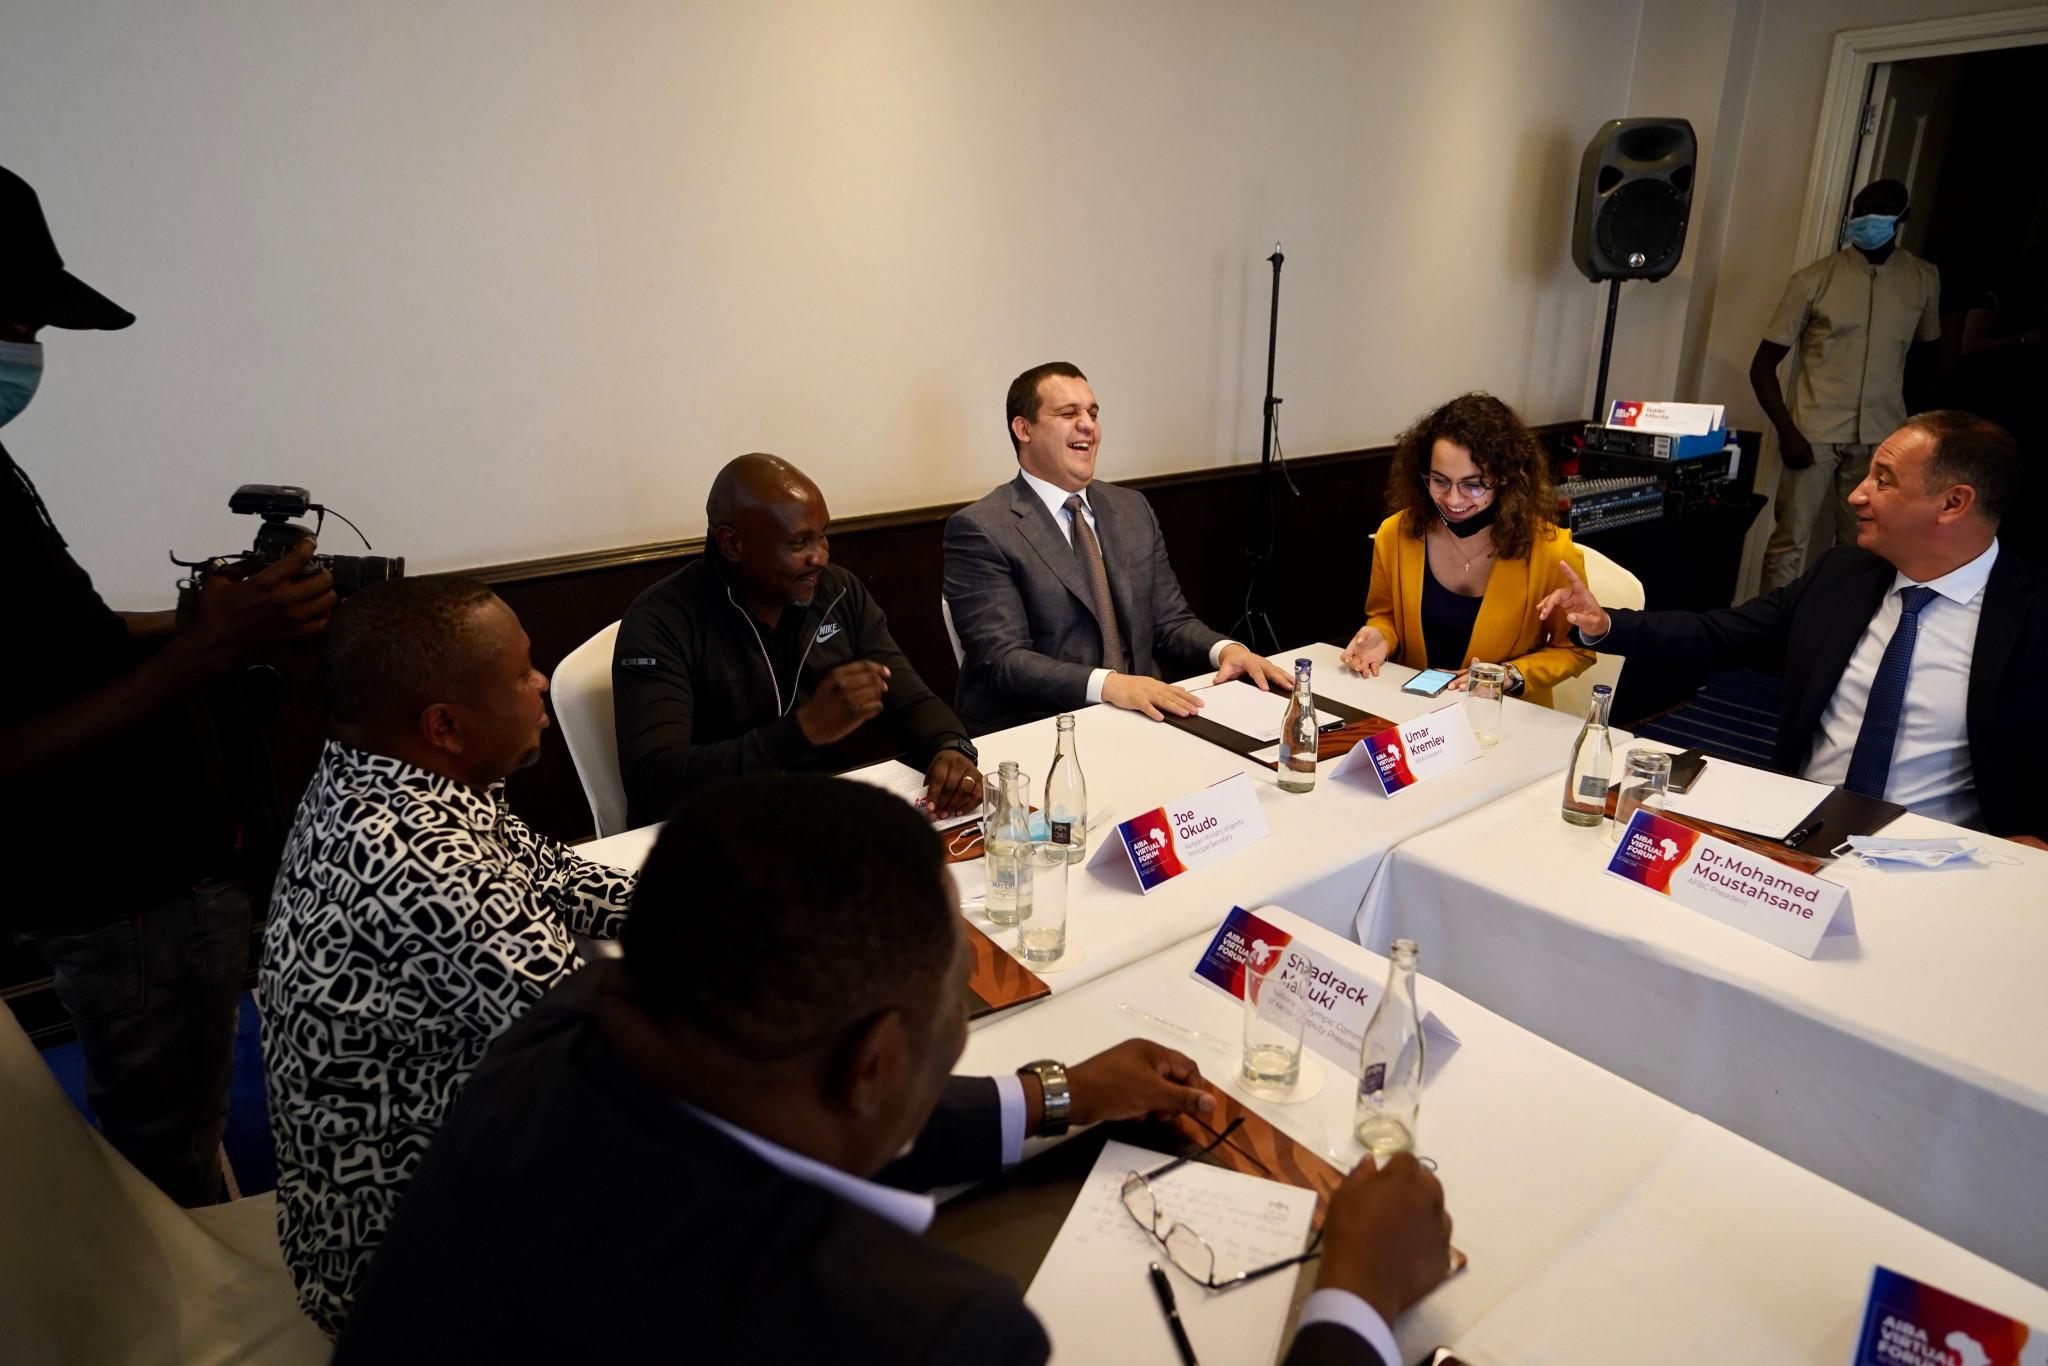 AIBA President Kremlev discusses plans for international boxing academy on visit to Kenya